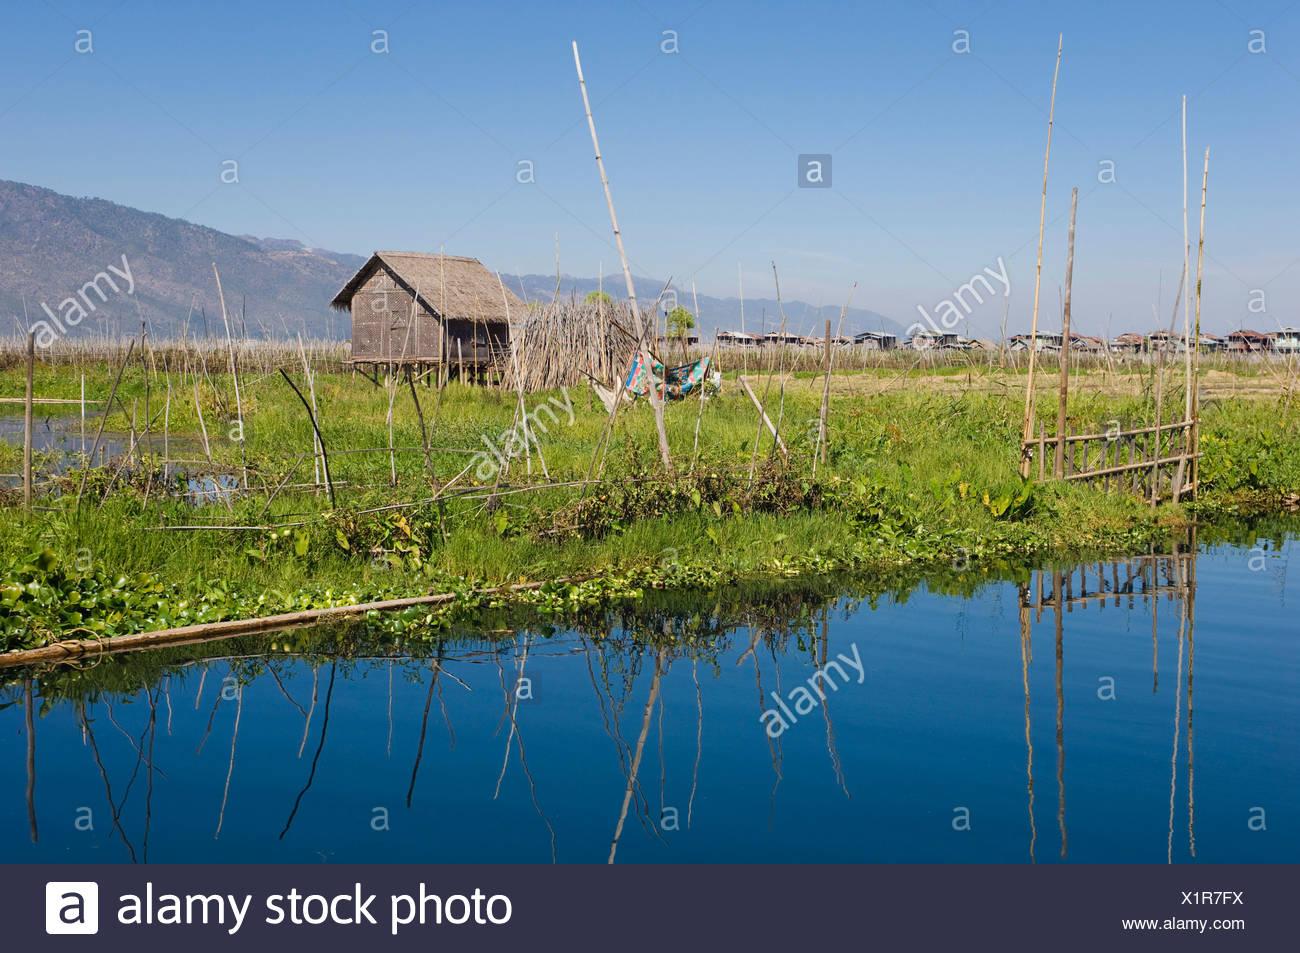 Floating Garden, Inle Lake, Shan State, Burma, Myanmar, Asia Stock Photo